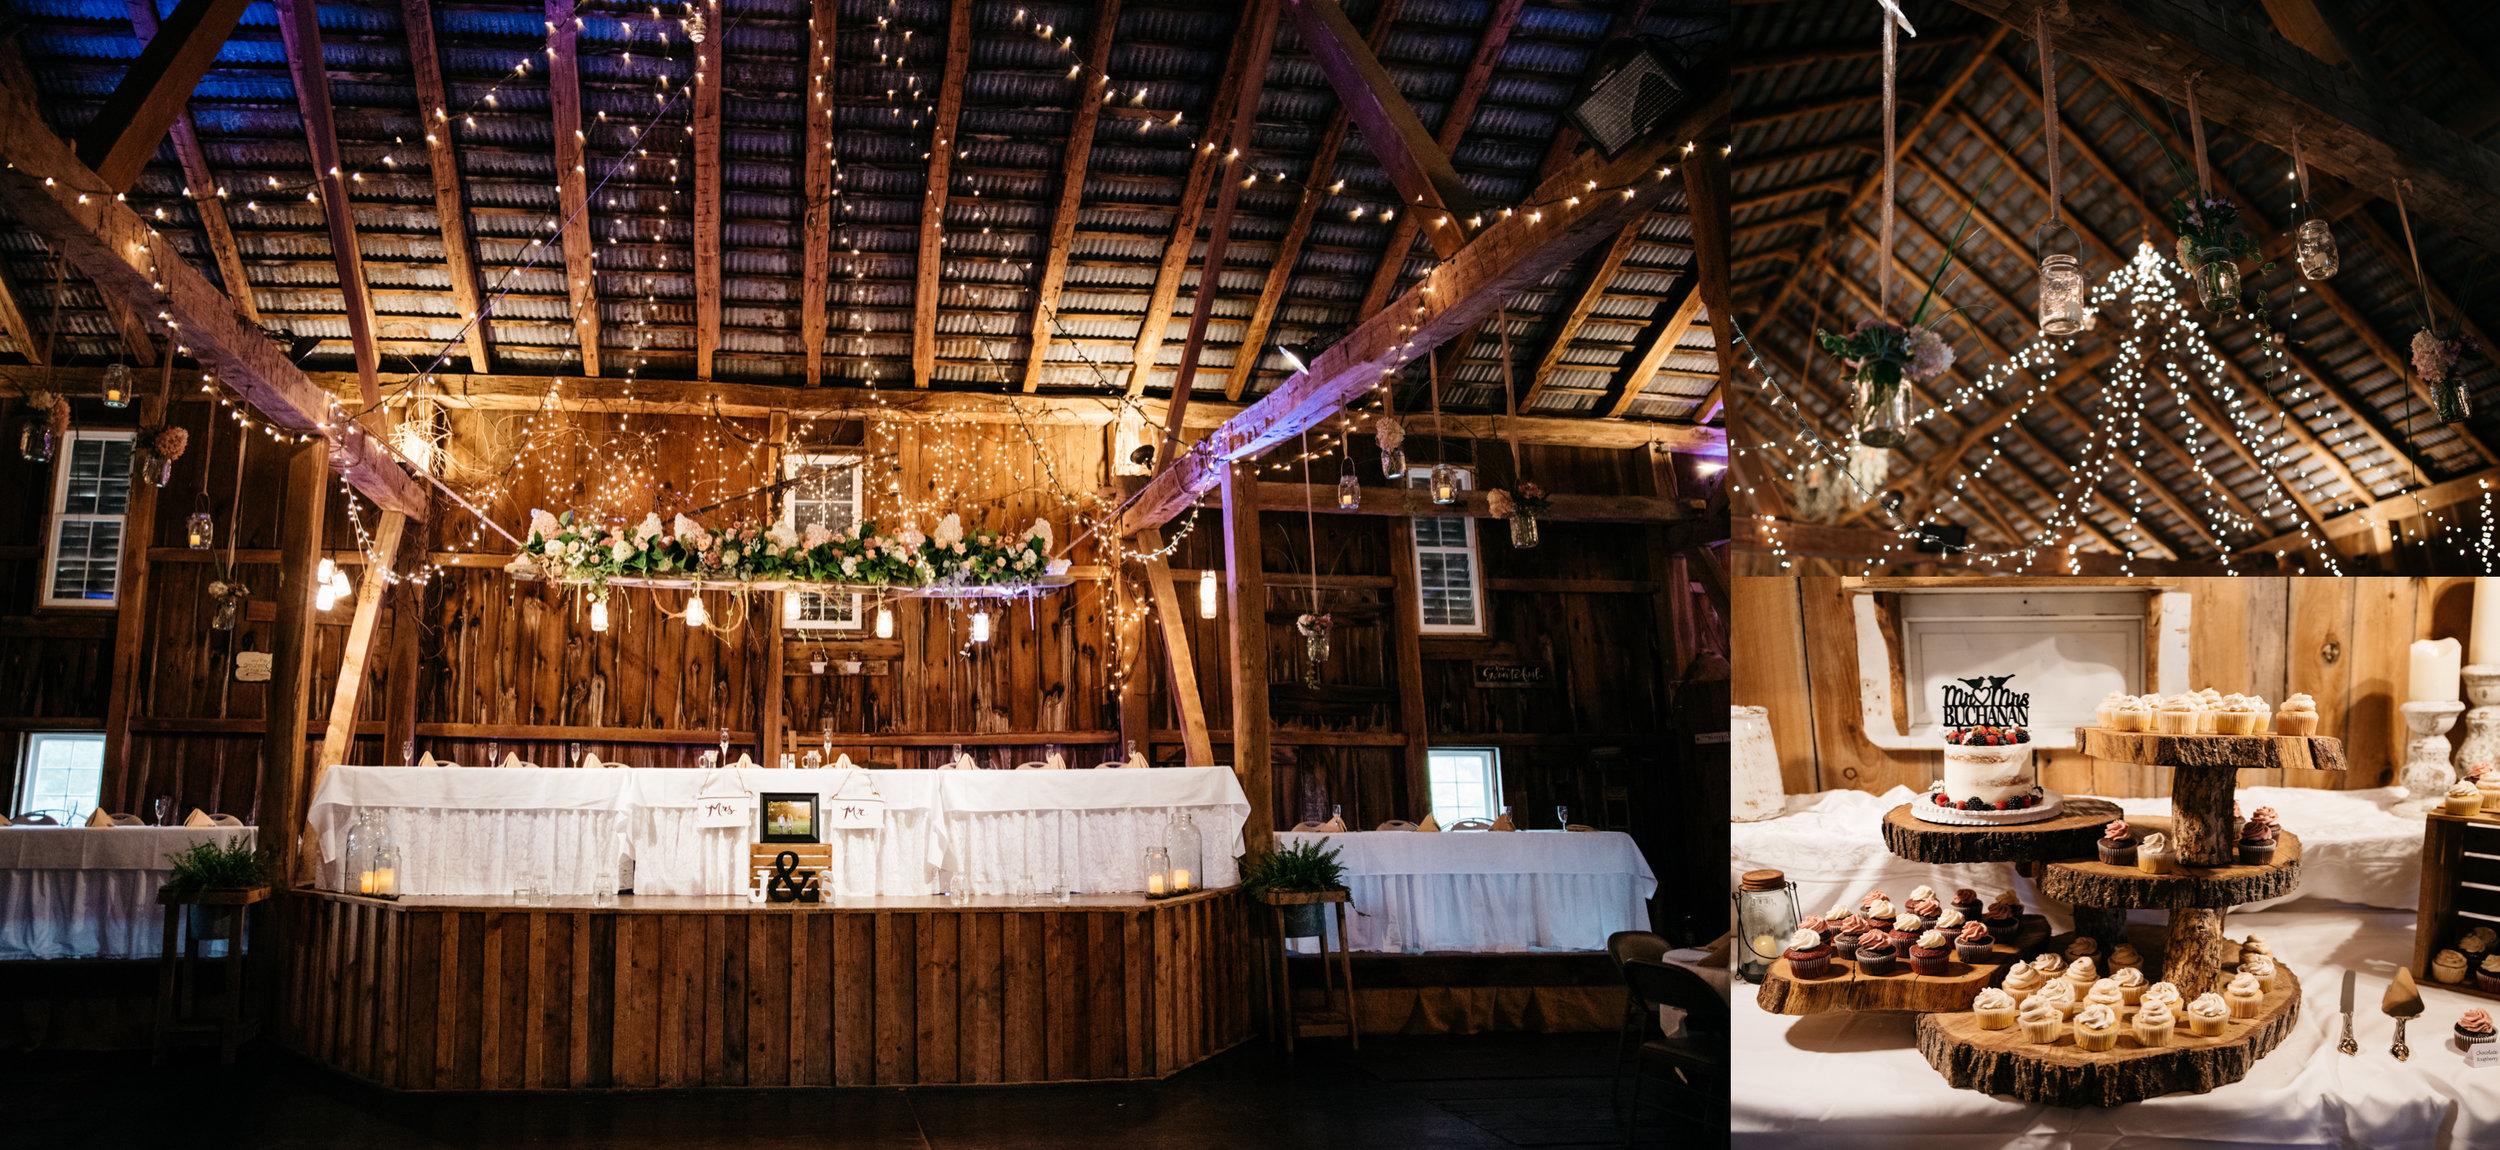 details, the Hayloft of PA wedding, Pittsburgh wedding photographer.jpg